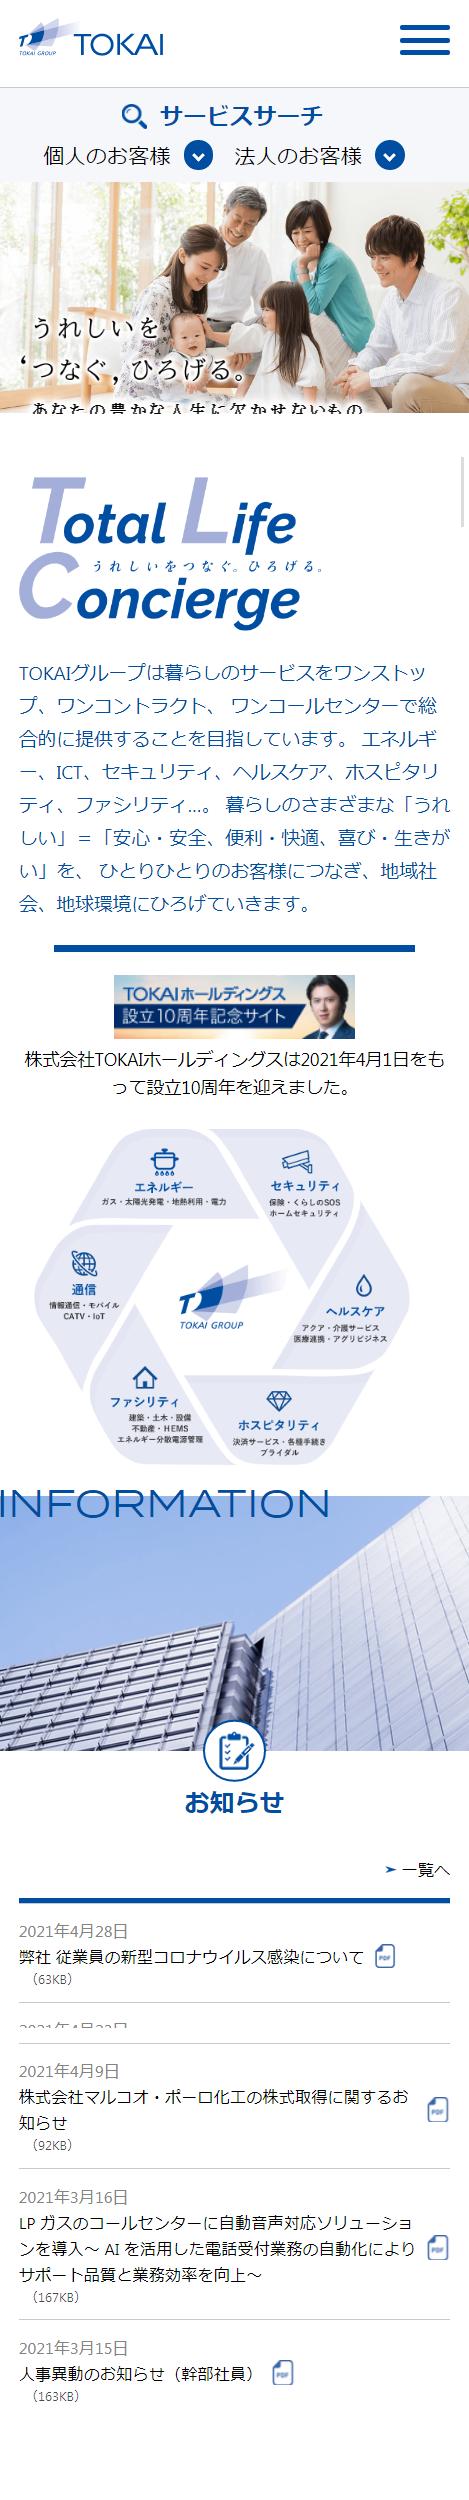 株式会社TOKAI様